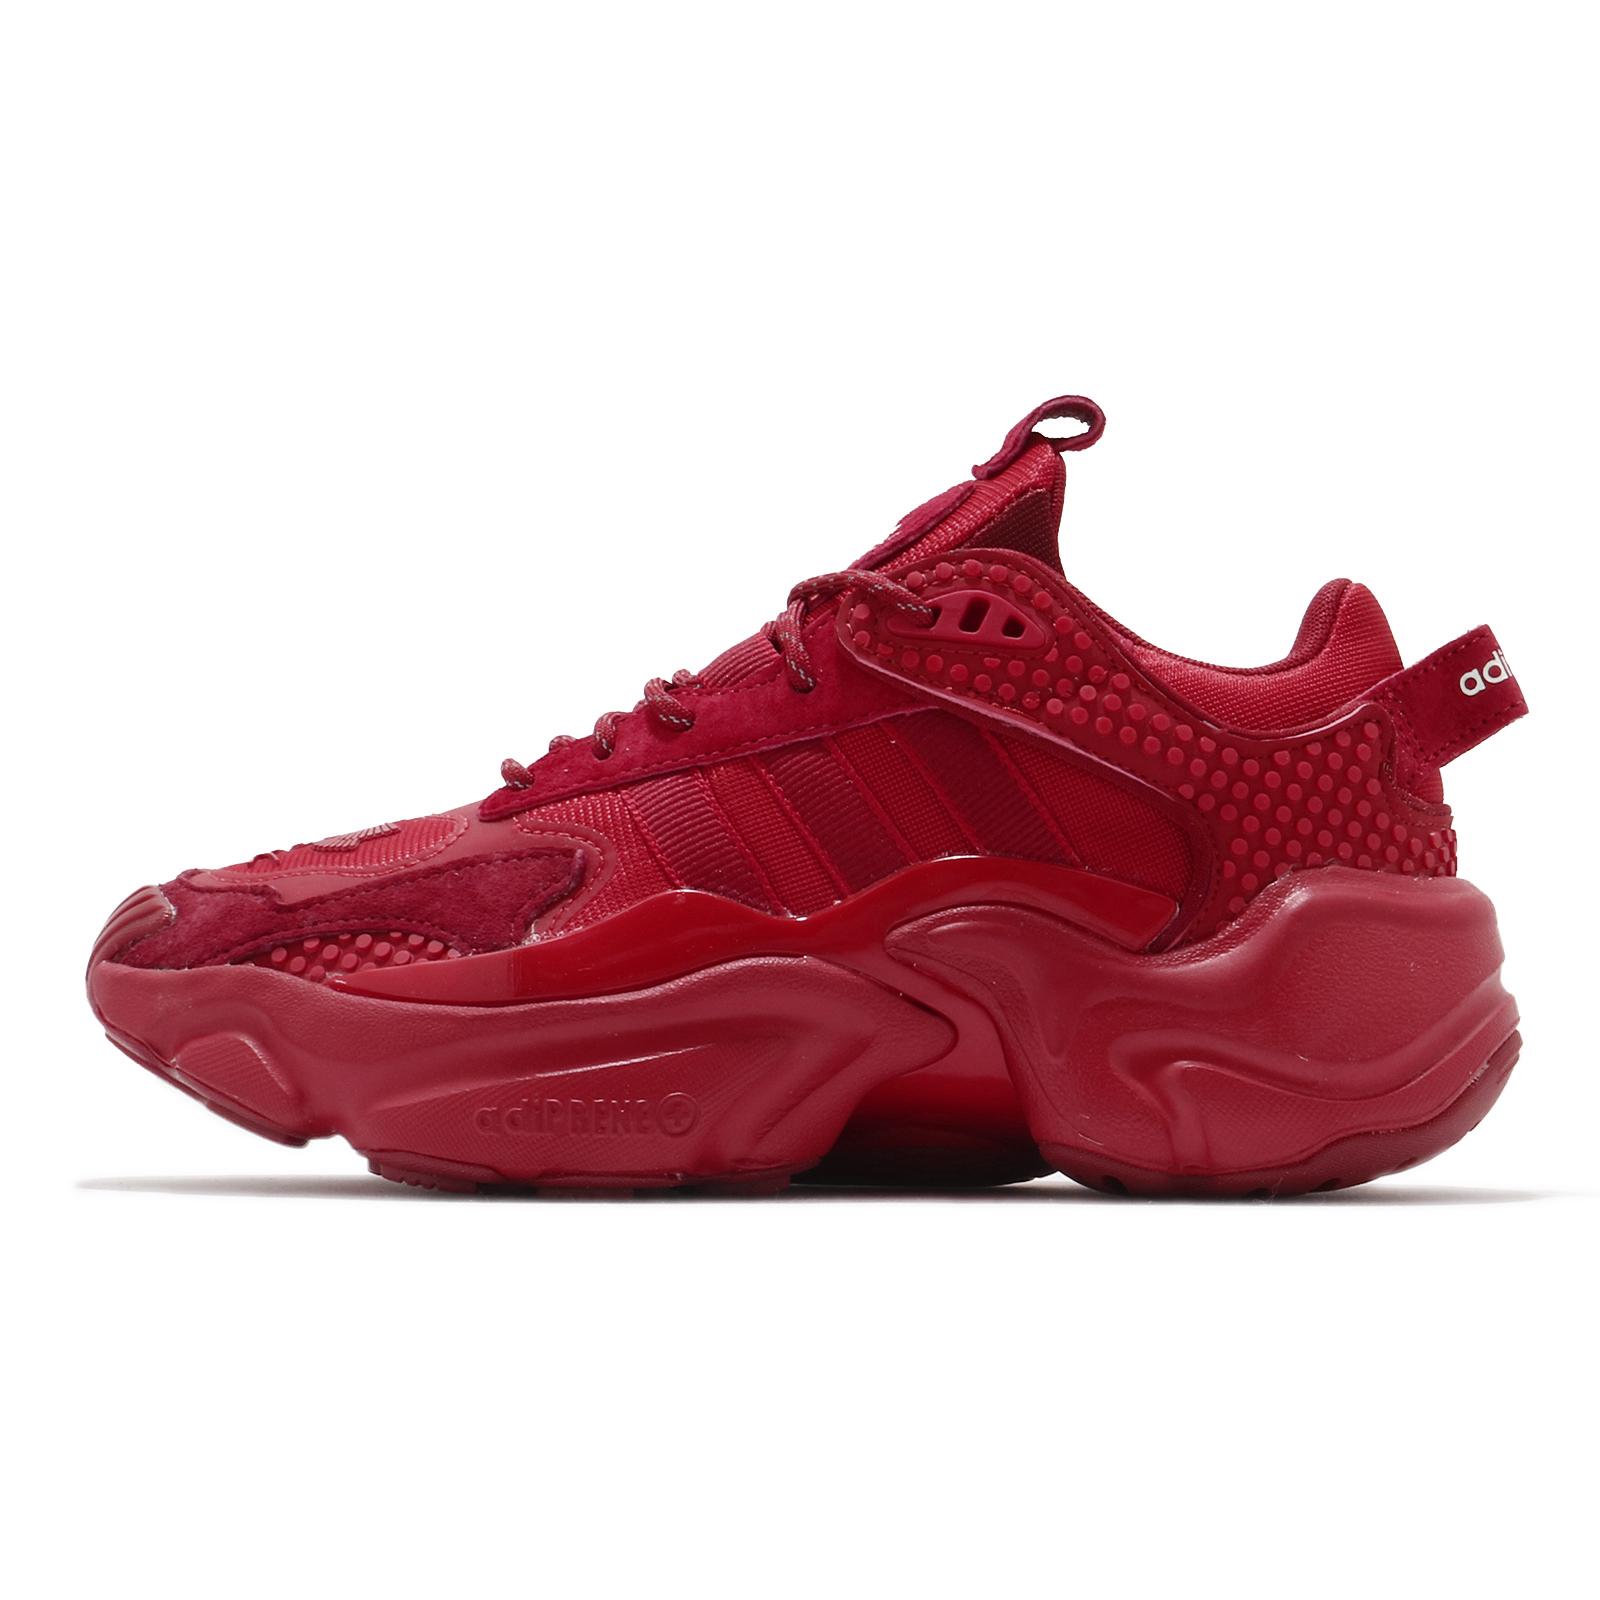 adidas 休閒鞋 Magmur Runner W AC 全紅 老爹鞋 限量聯名款 女鞋【ACS】 FX1942